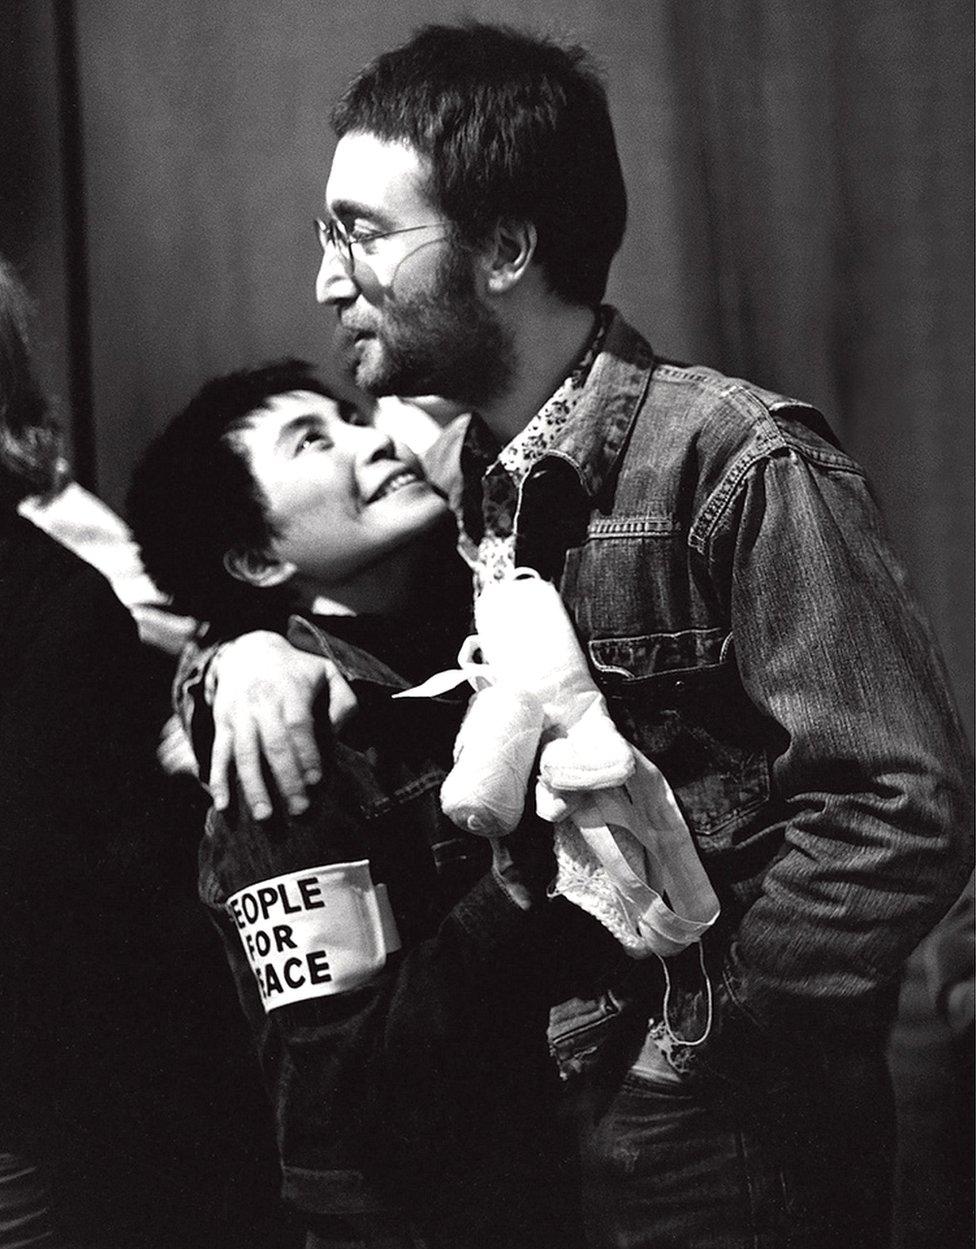 John & Yoko/Plastic Ono Band: 50 years on-714ba826-b93b-4325-919a-eef3b4fc7d9f-jpeg